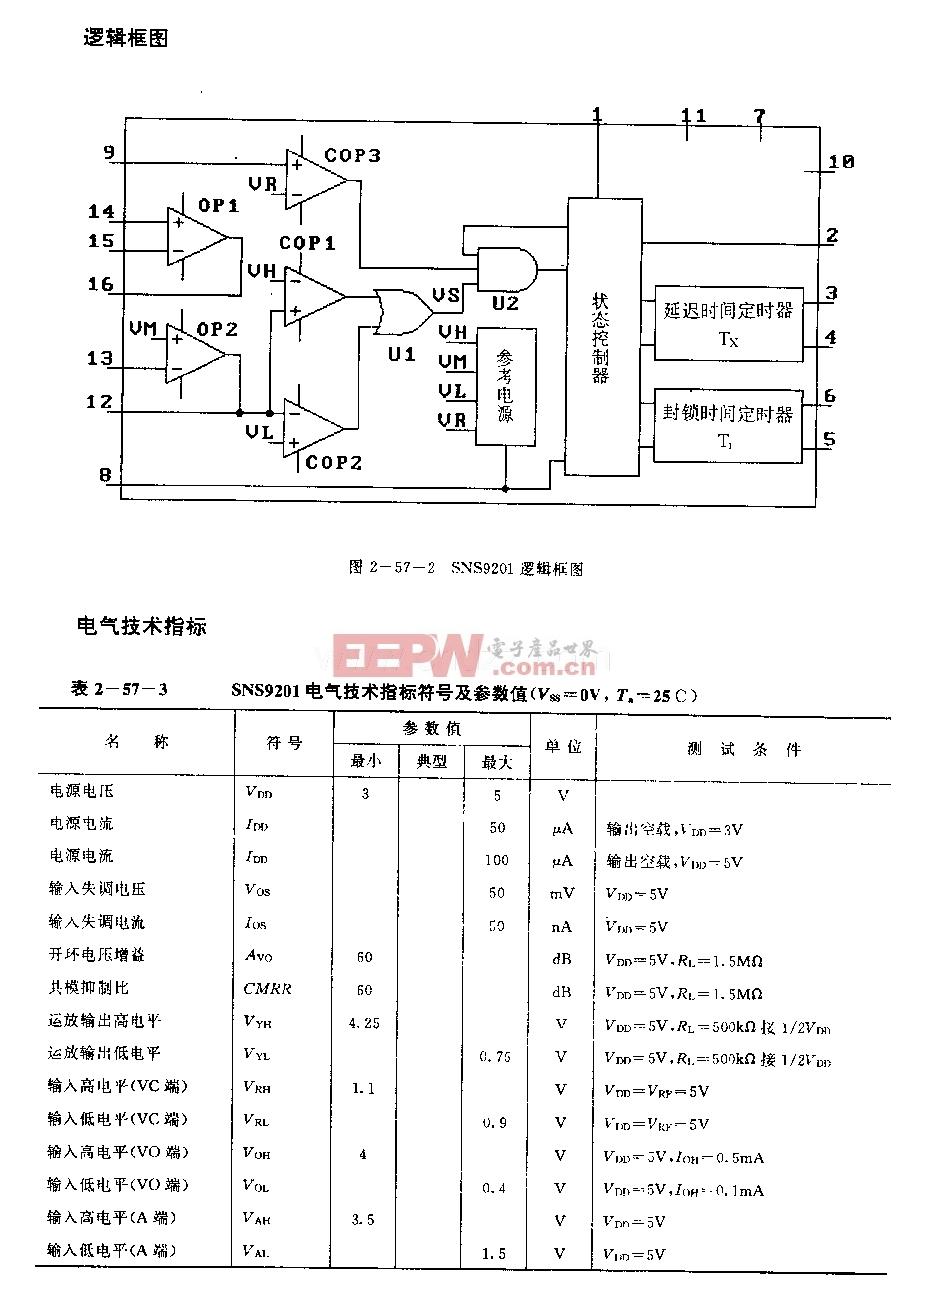 SNS9201 (家用电器、机器入、医疗设备或报警装置)红外线传感信号